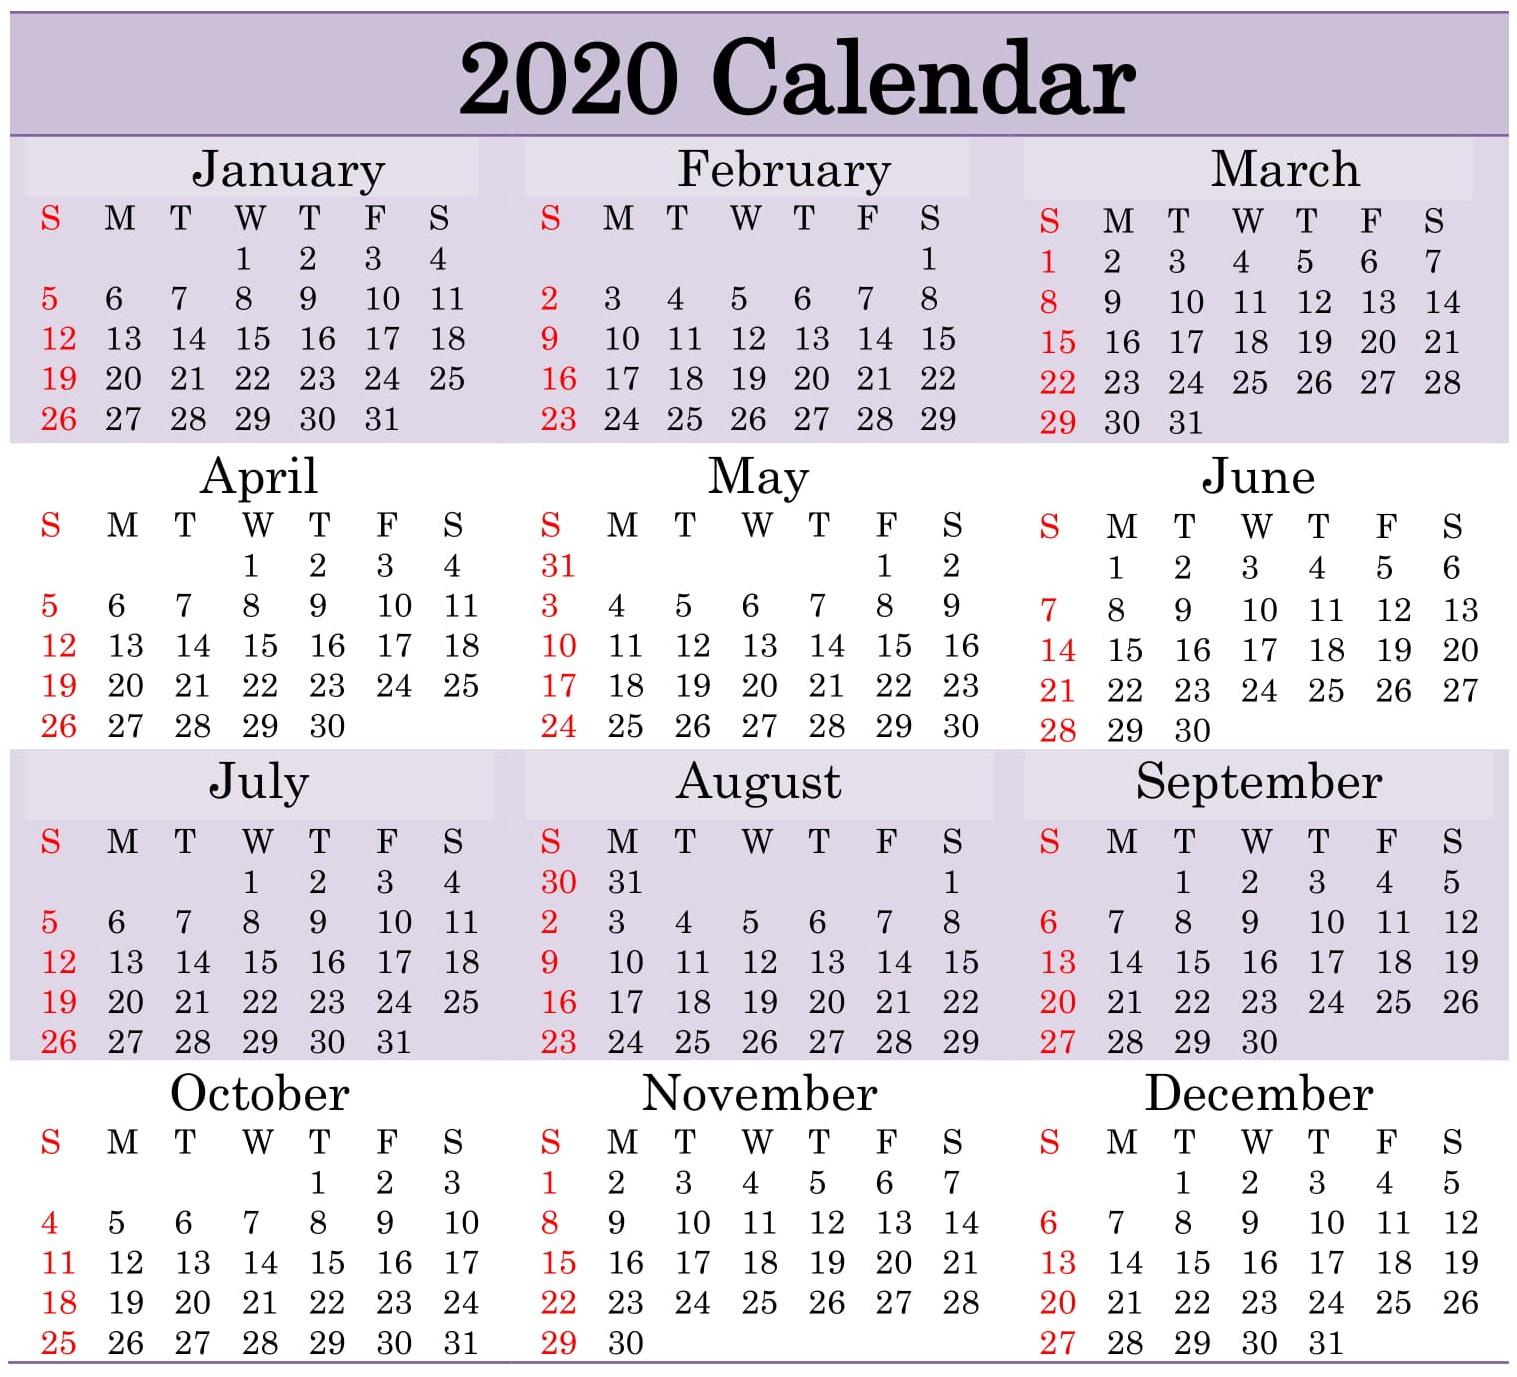 Printable 2020 Calendar Word Document  Latest Printable regarding Printable Calander 2020